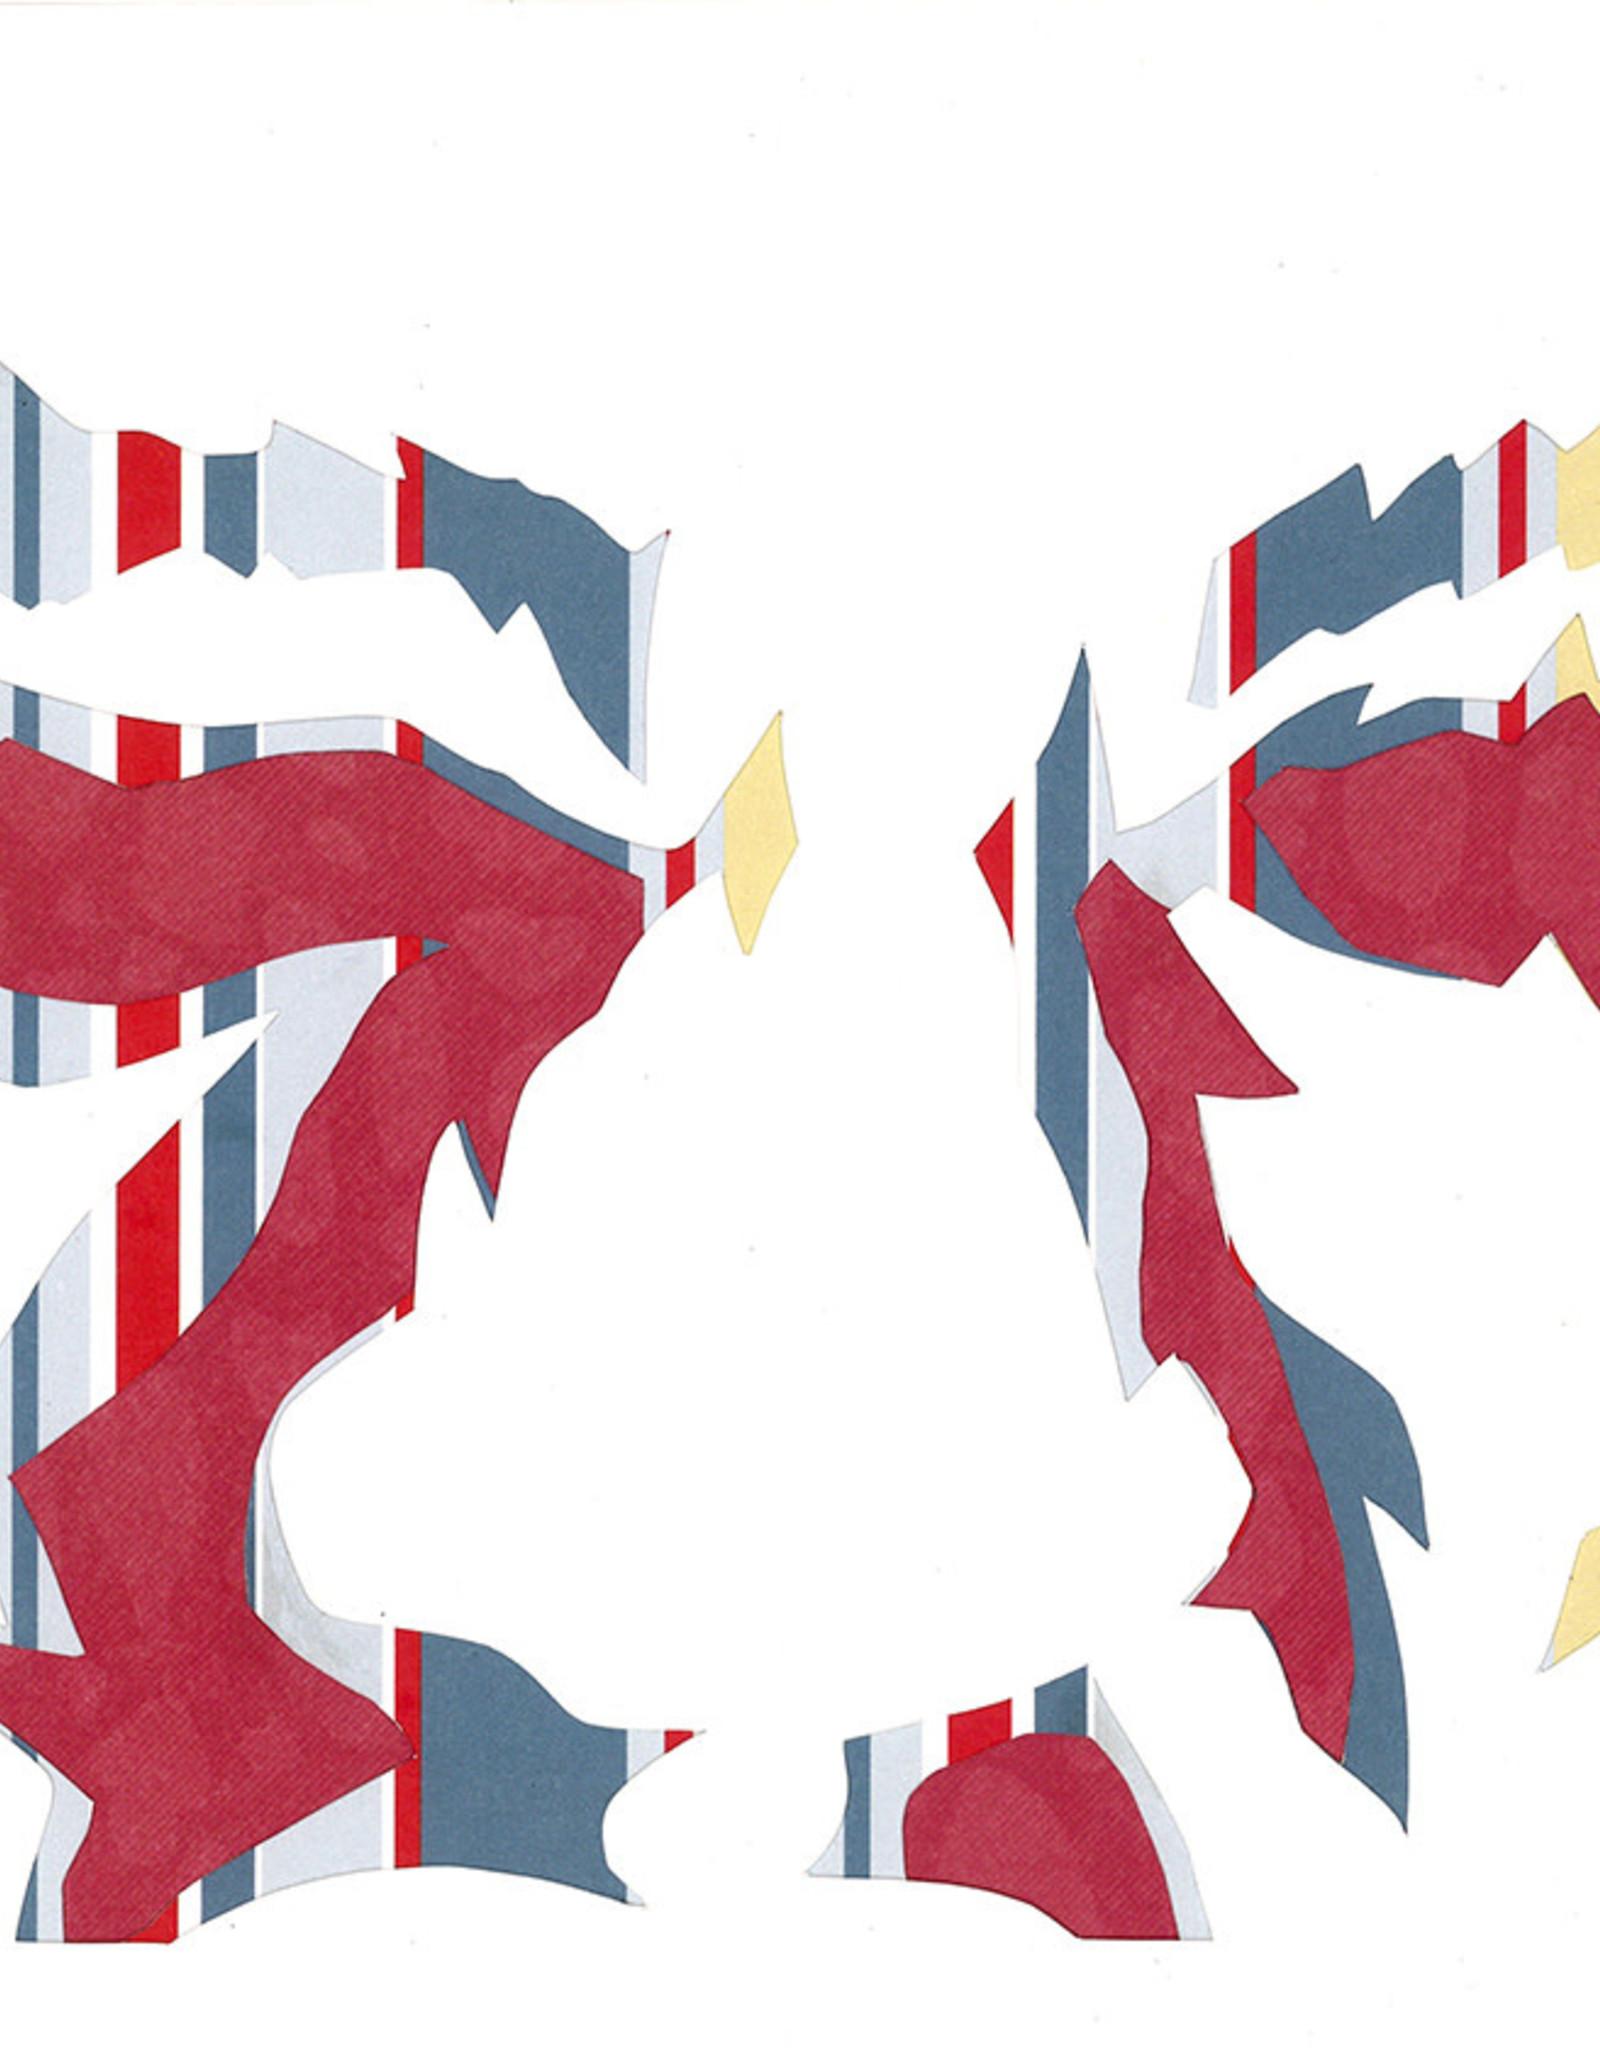 Gray Jones Face to Face -Cutout 9x12 #8